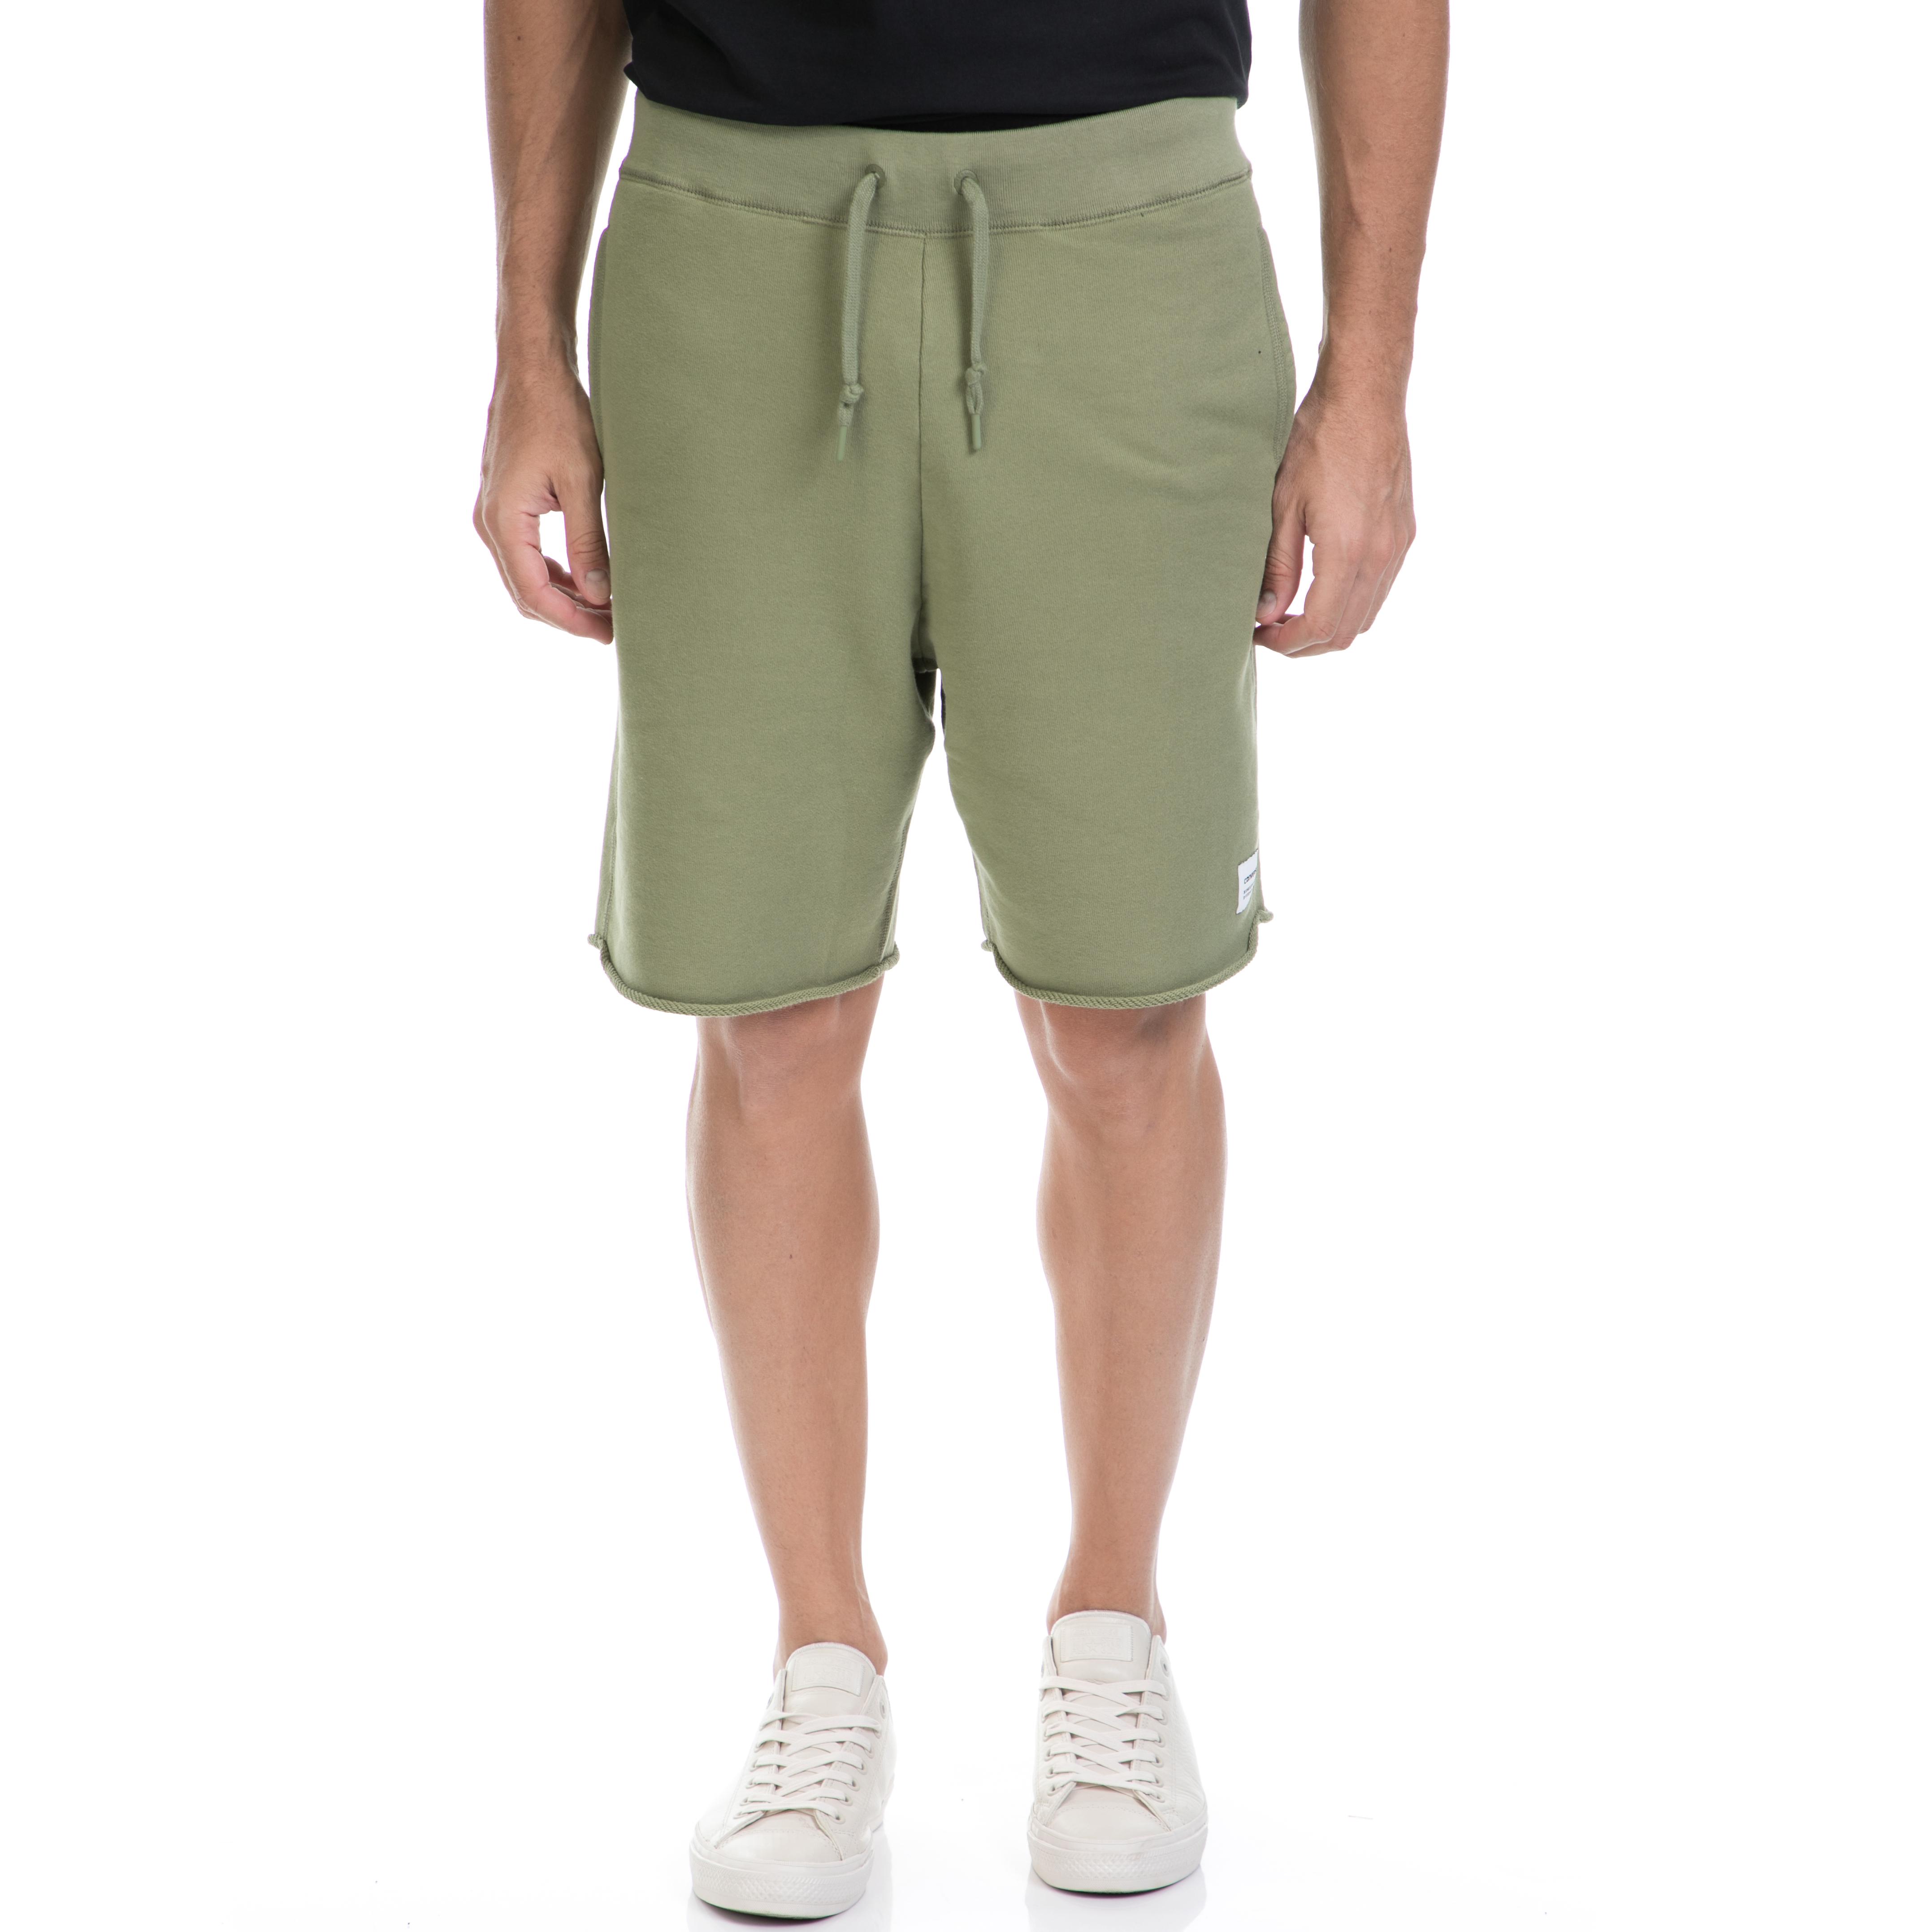 CONVERSE - Αντρική βερμούδα CONVERSE χακί ανδρικά ρούχα σορτς βερμούδες αθλητικά